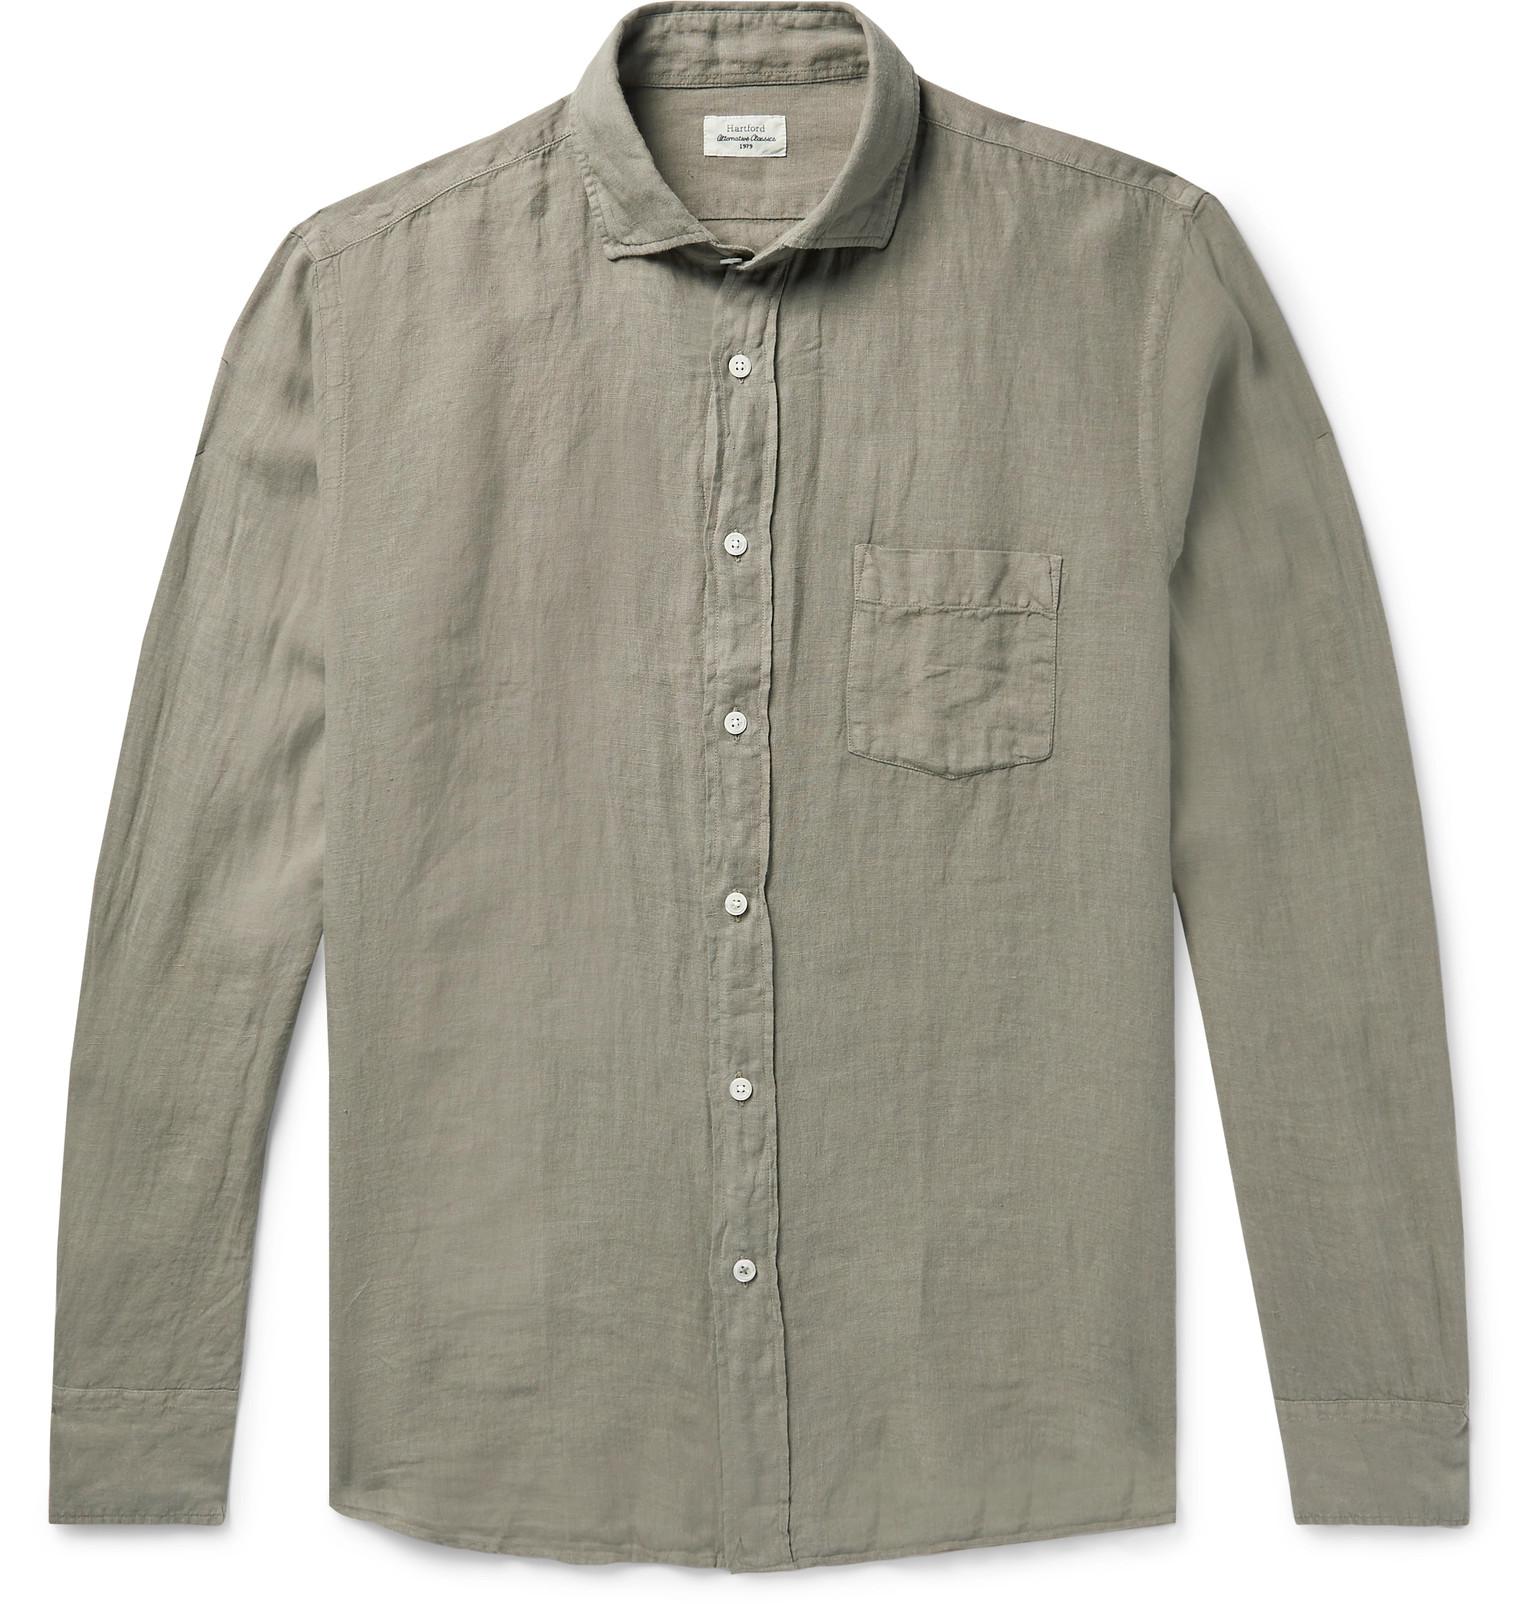 ae55abb39bcf Hartford - Paul Pat Slim-Fit Linen Shirt